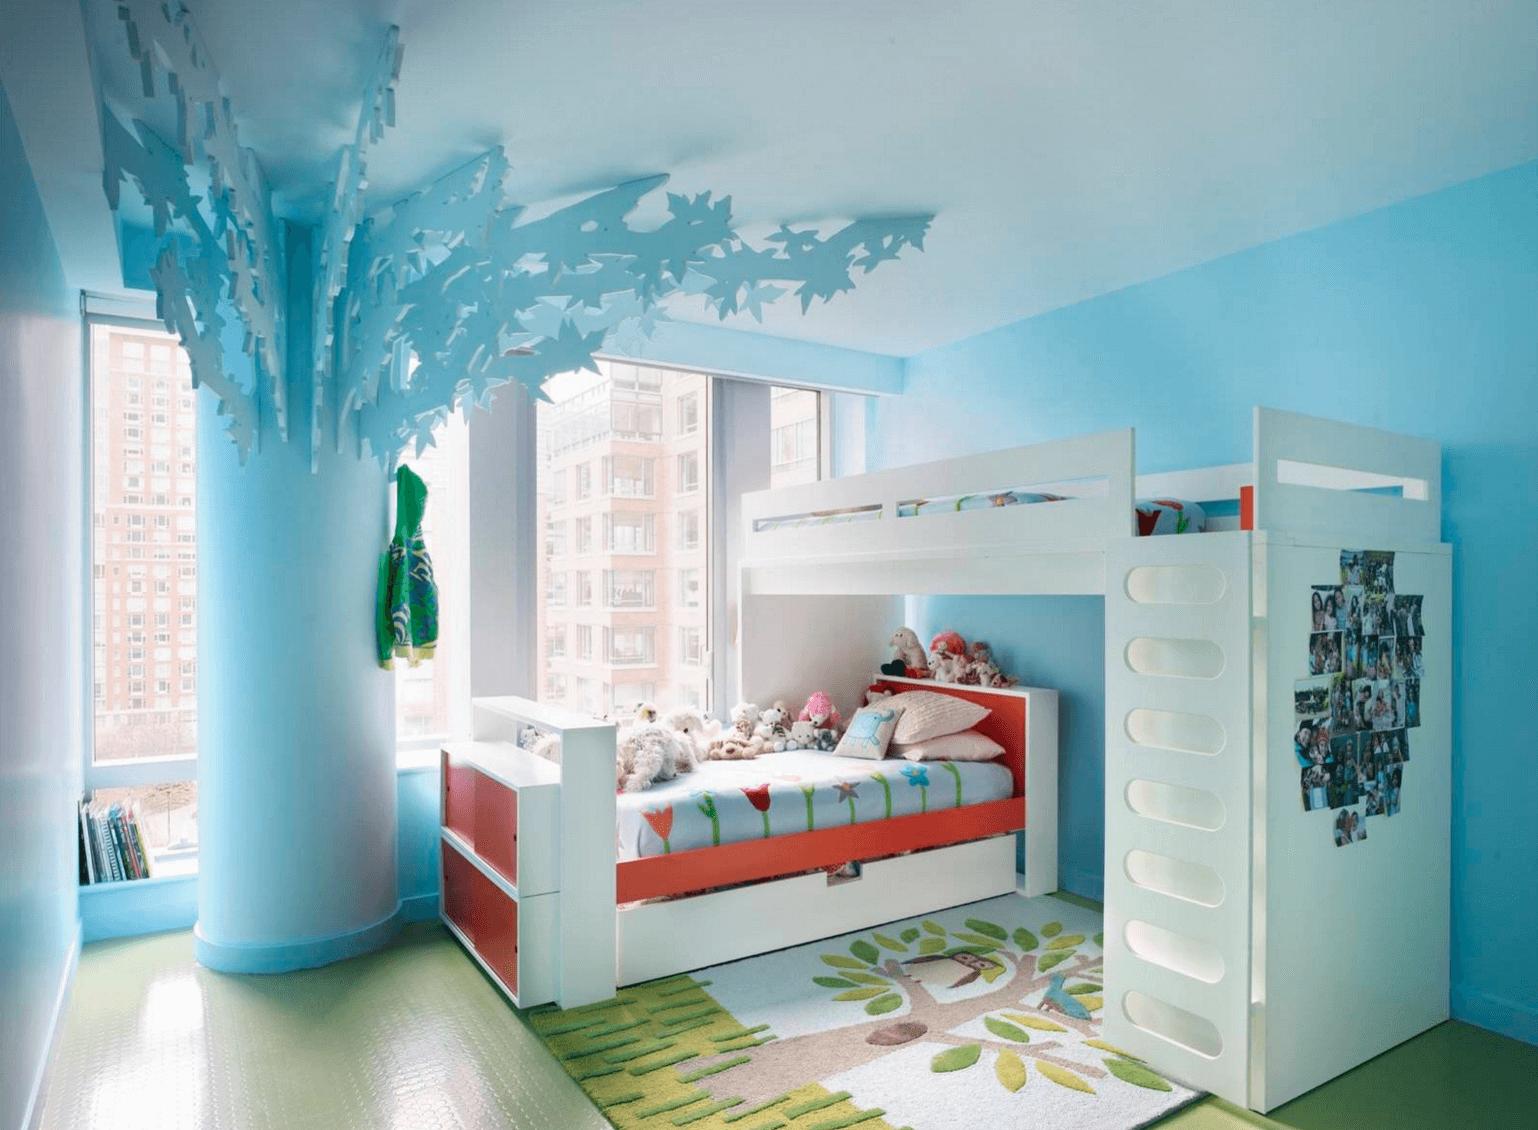 kids room ideas bohemian park bedroom FZQHWPX